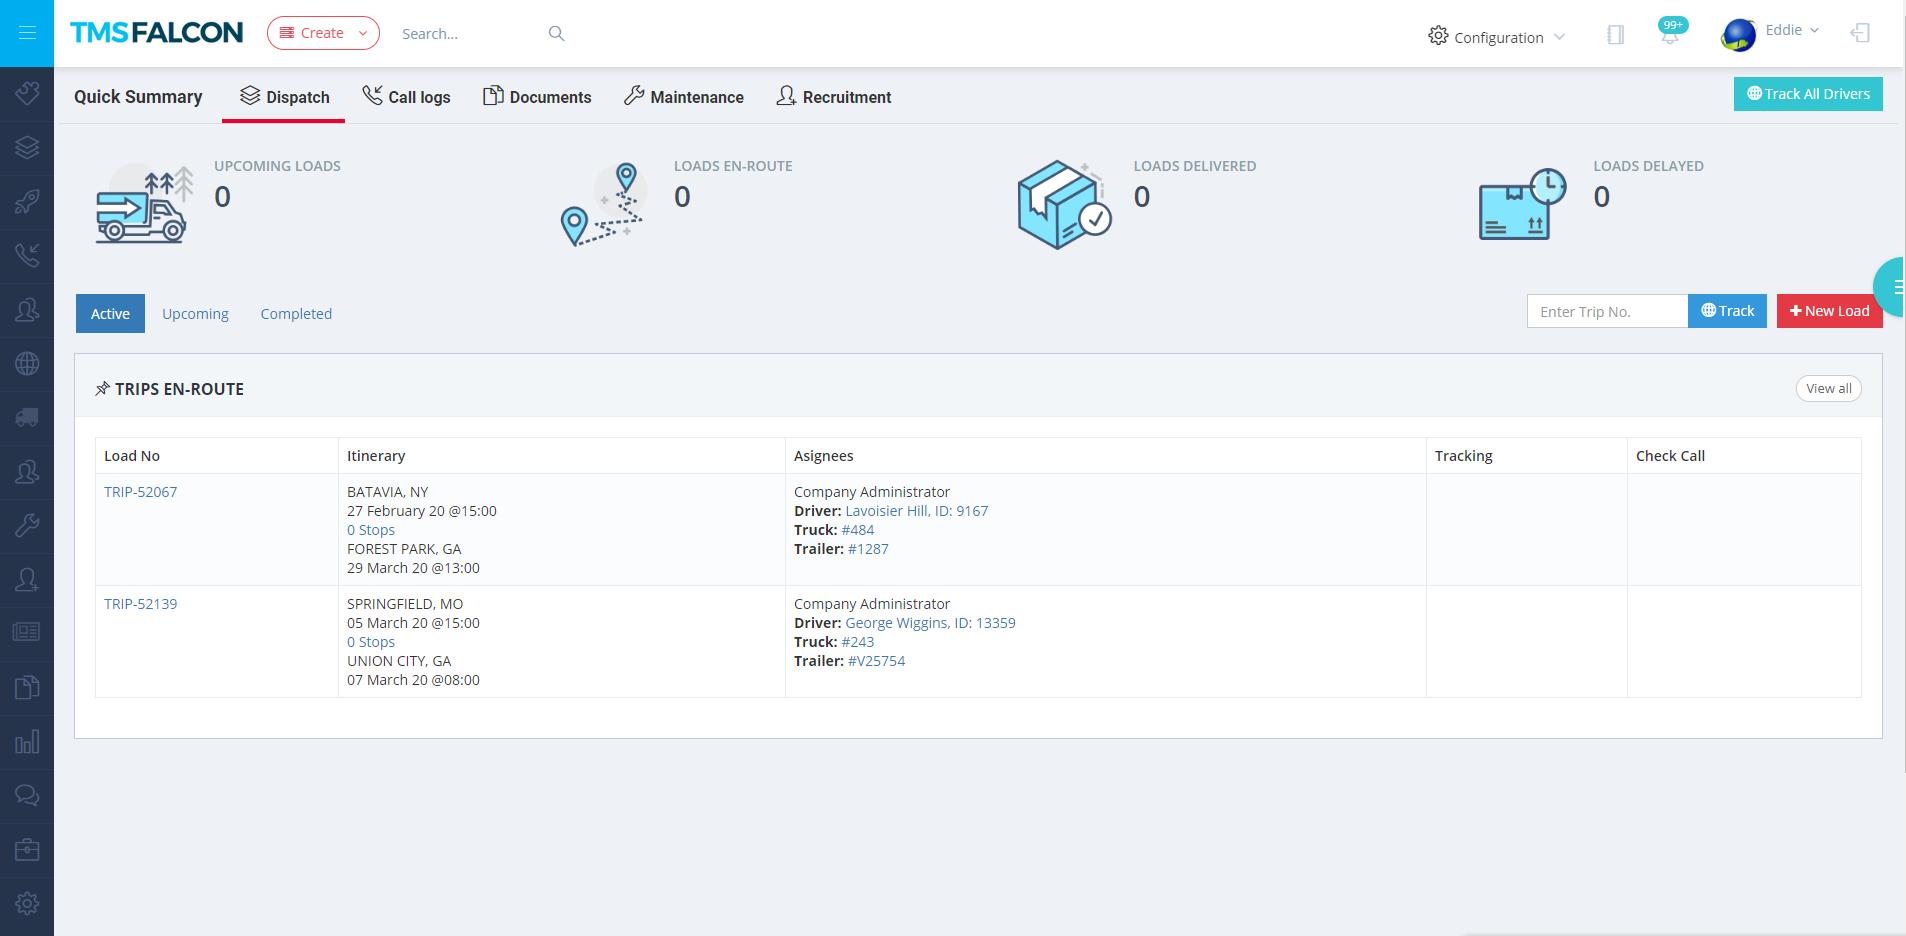 TMSFALCON Web App